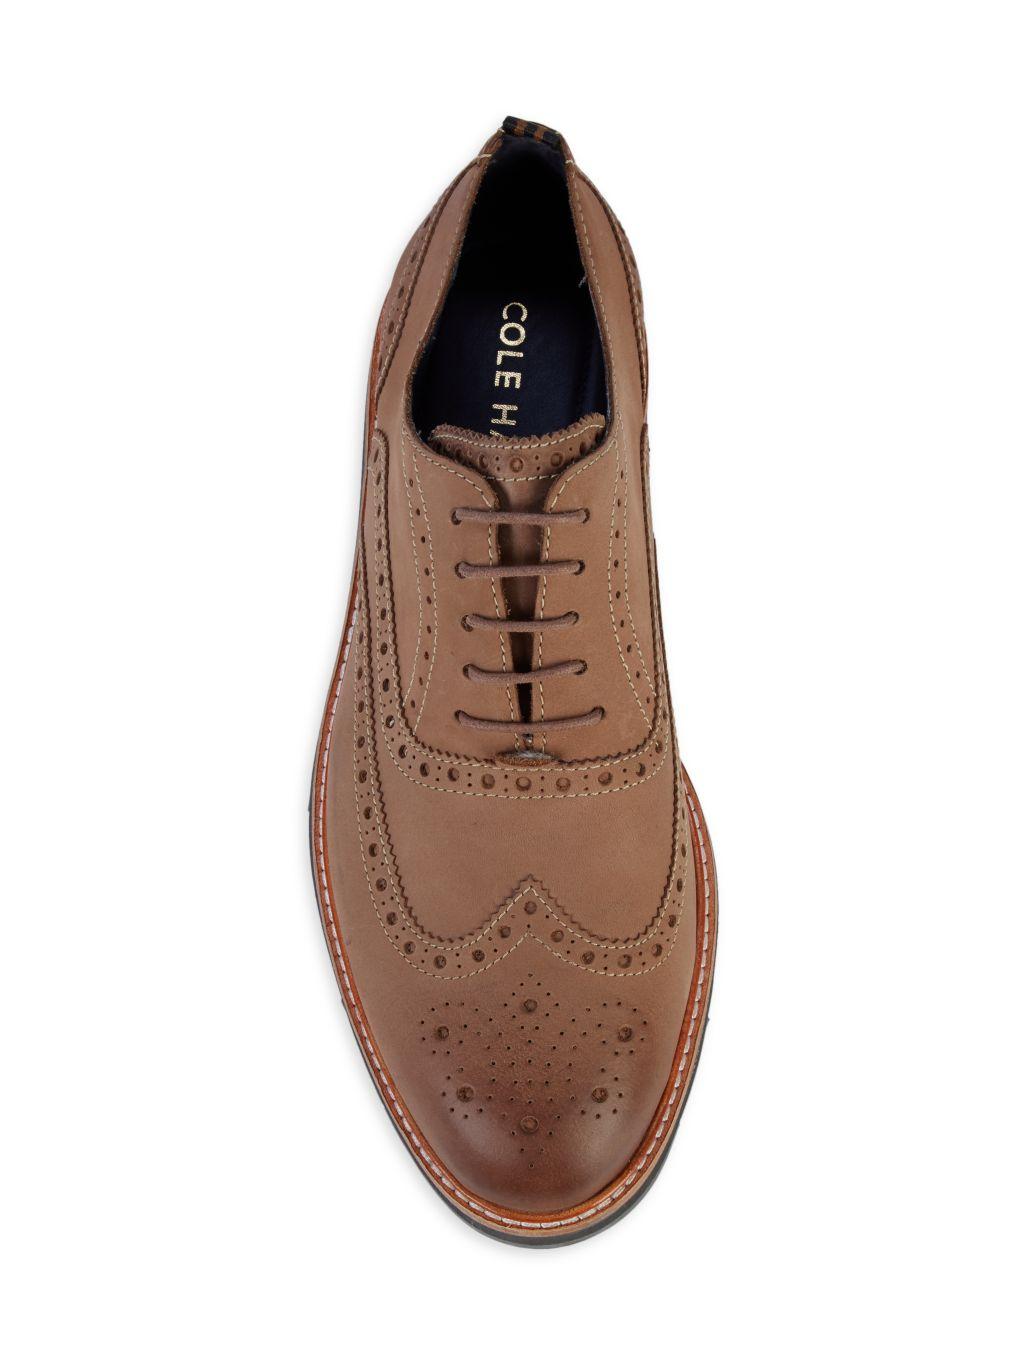 Cole Haan Morris Suede Wingtip Oxford Loafers